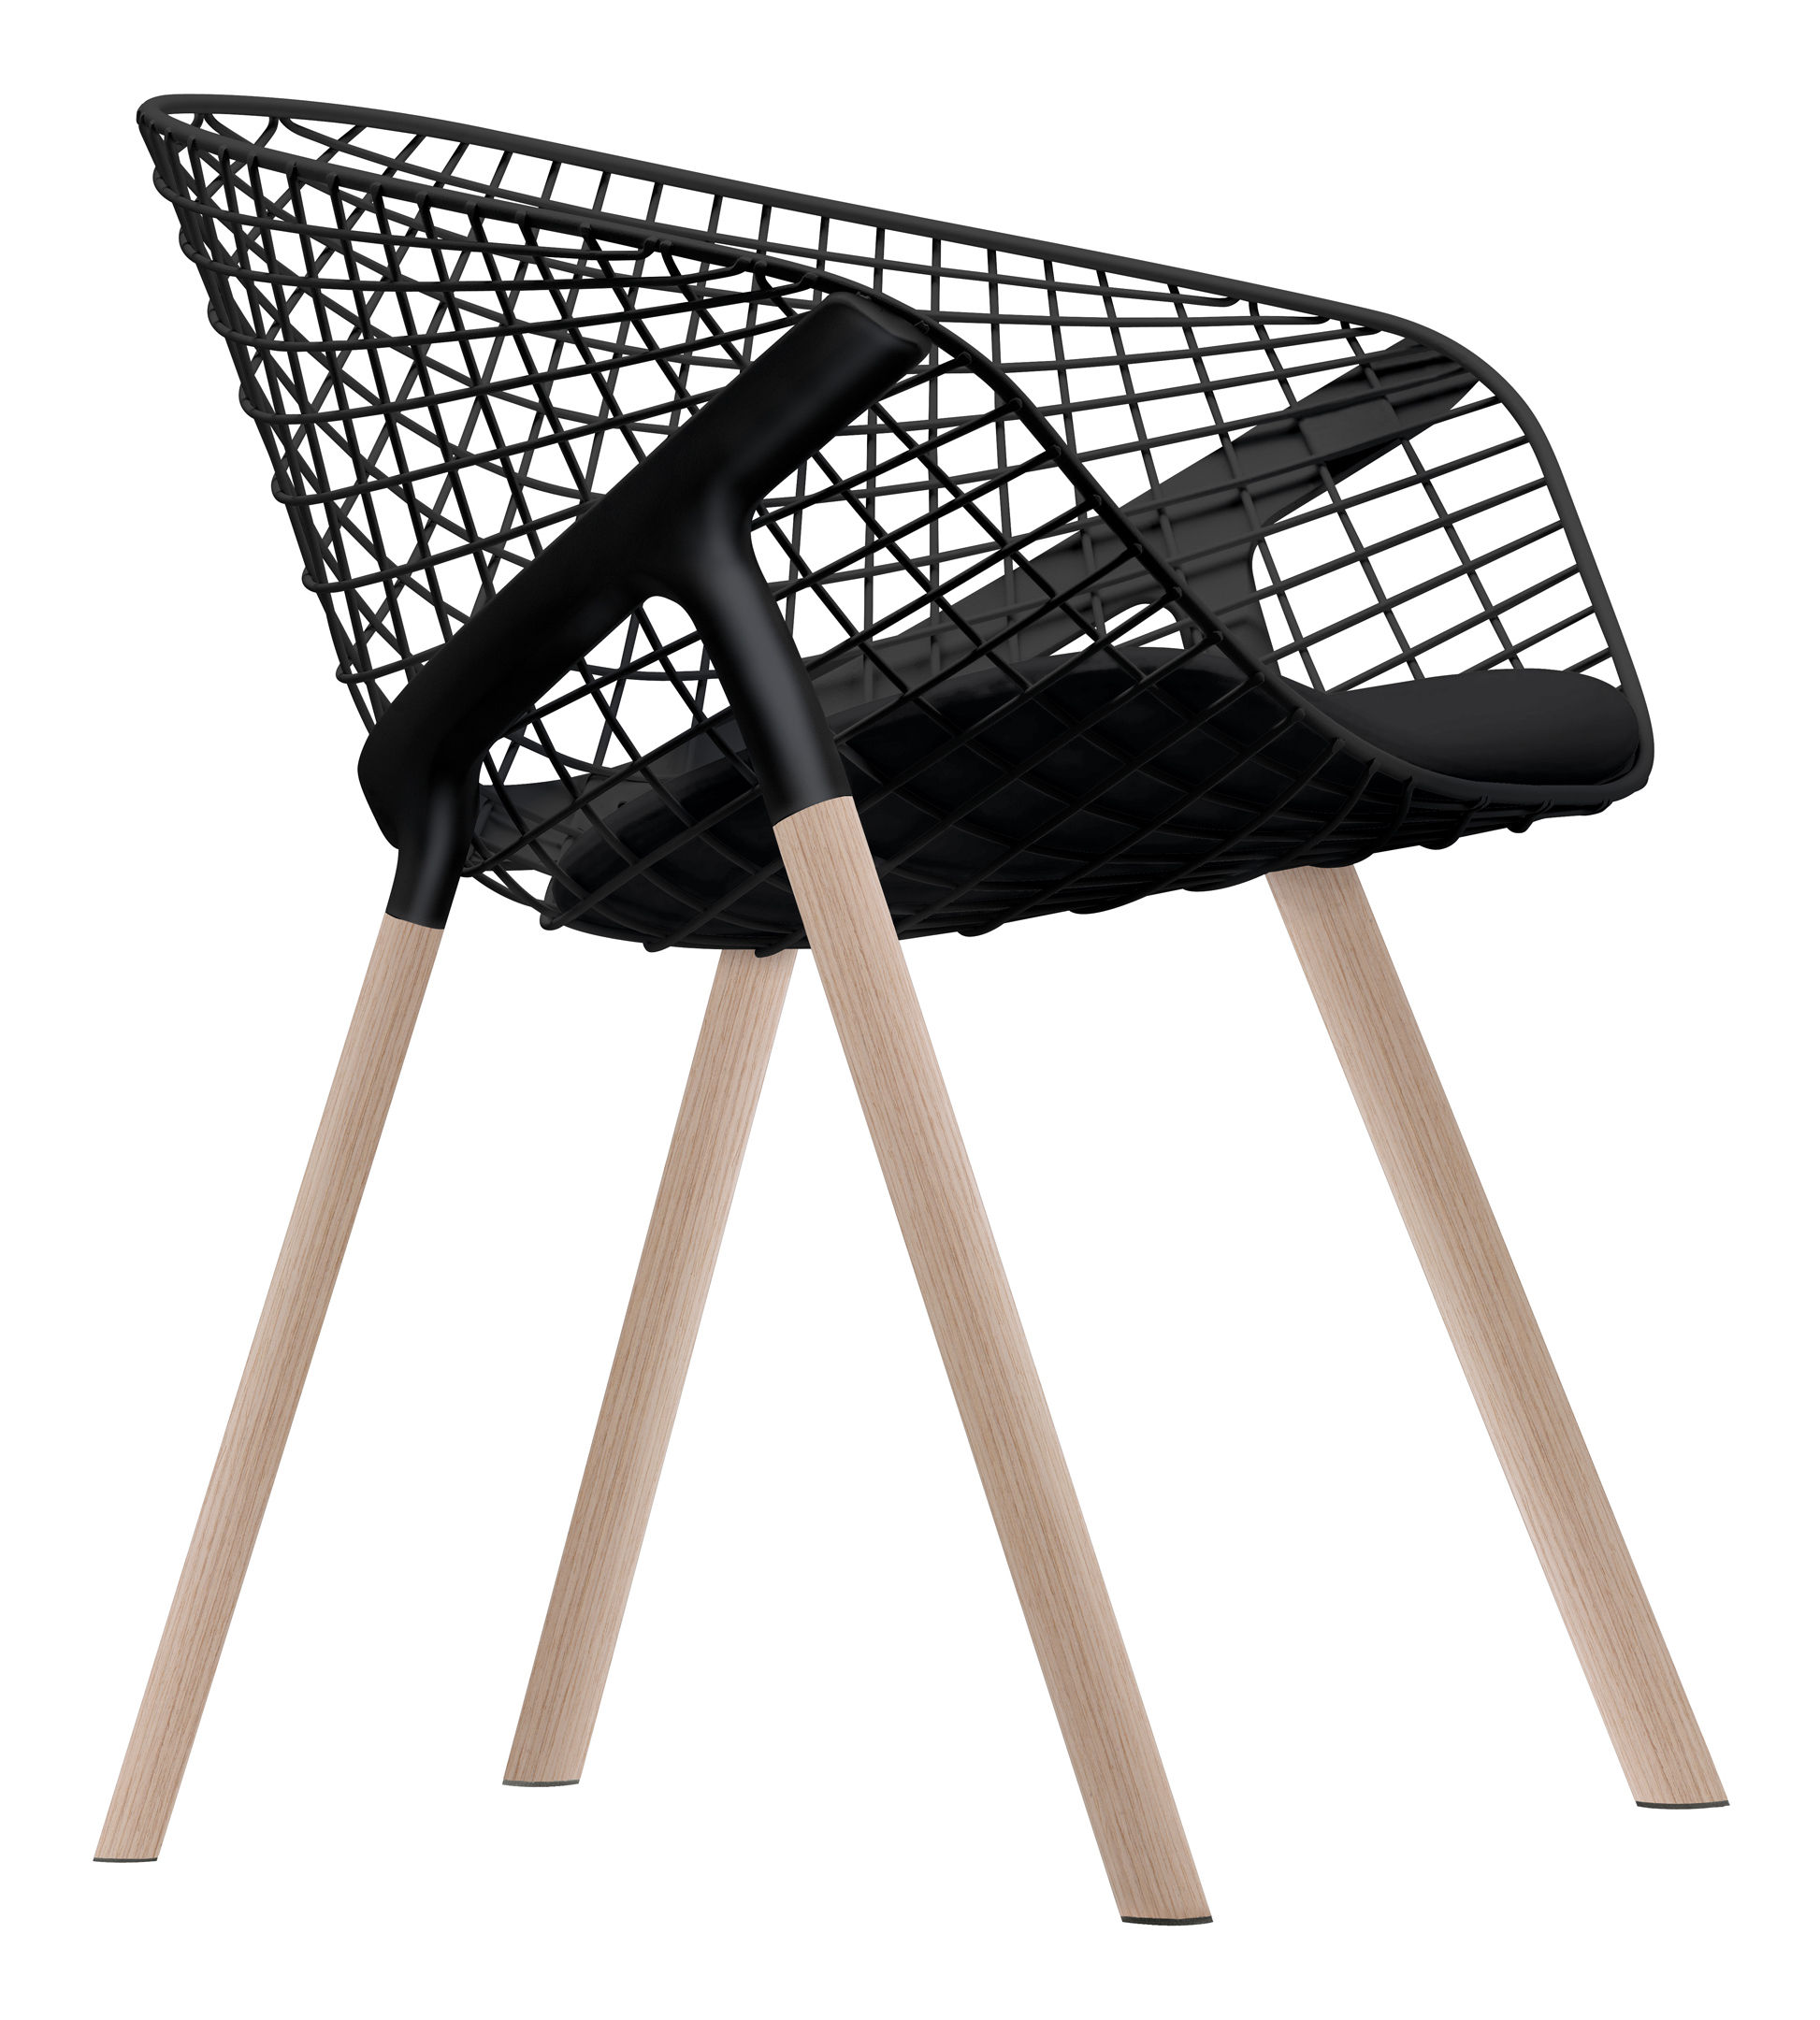 Furniture - Chairs - Kobi Wood Armchair - Metal & wood legs / Small cushion by Alias - Oak legs - Black shell - Black cushion - Fabric, Lacquered steel, Oak